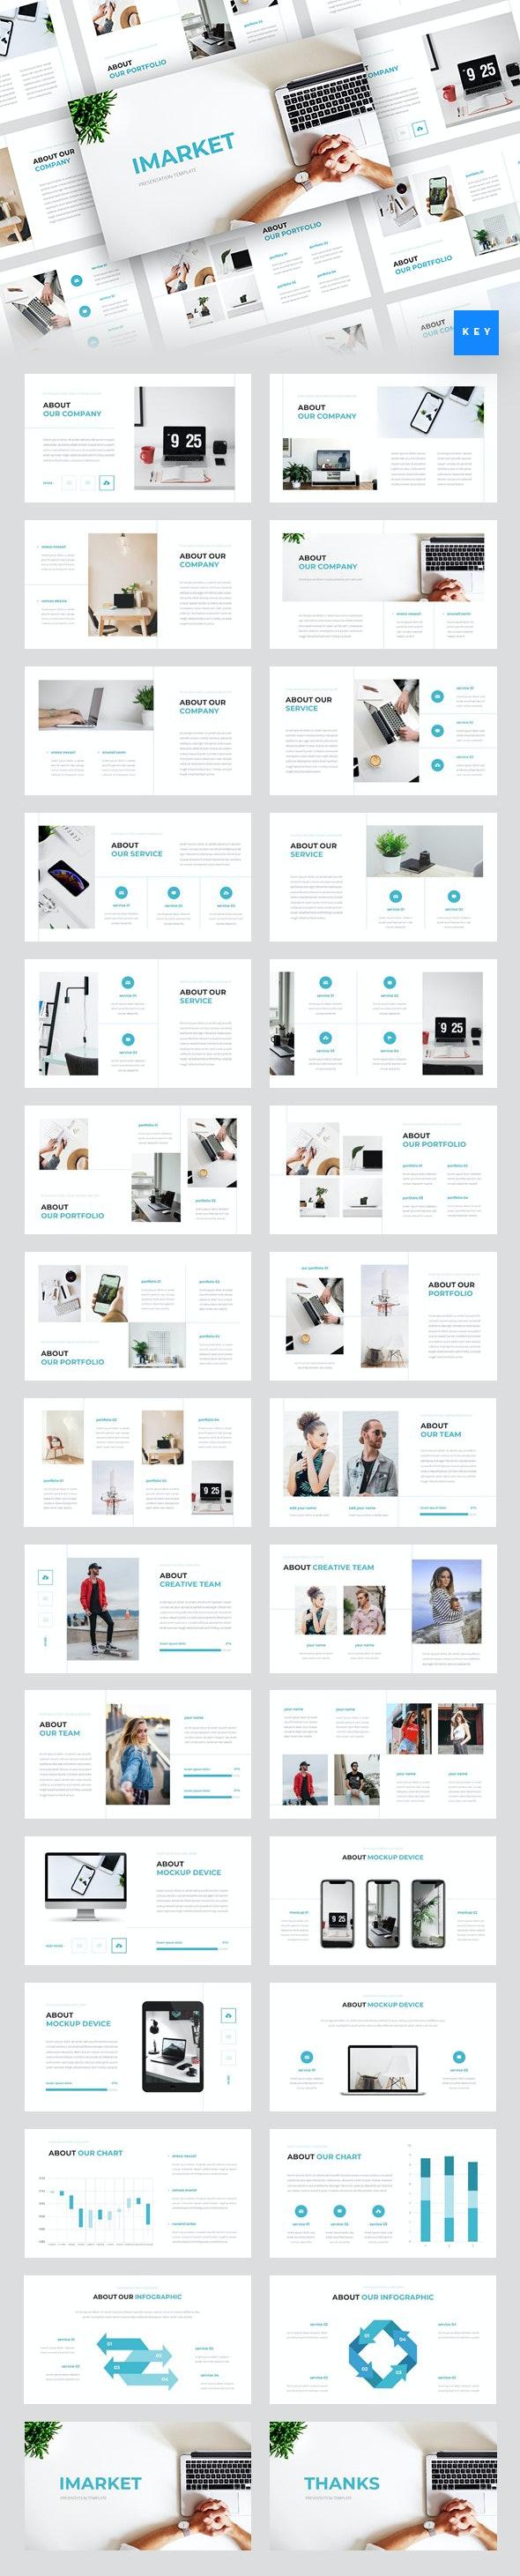 Imarket - Internet Marketing Keynote Template - Business Keynote Templates